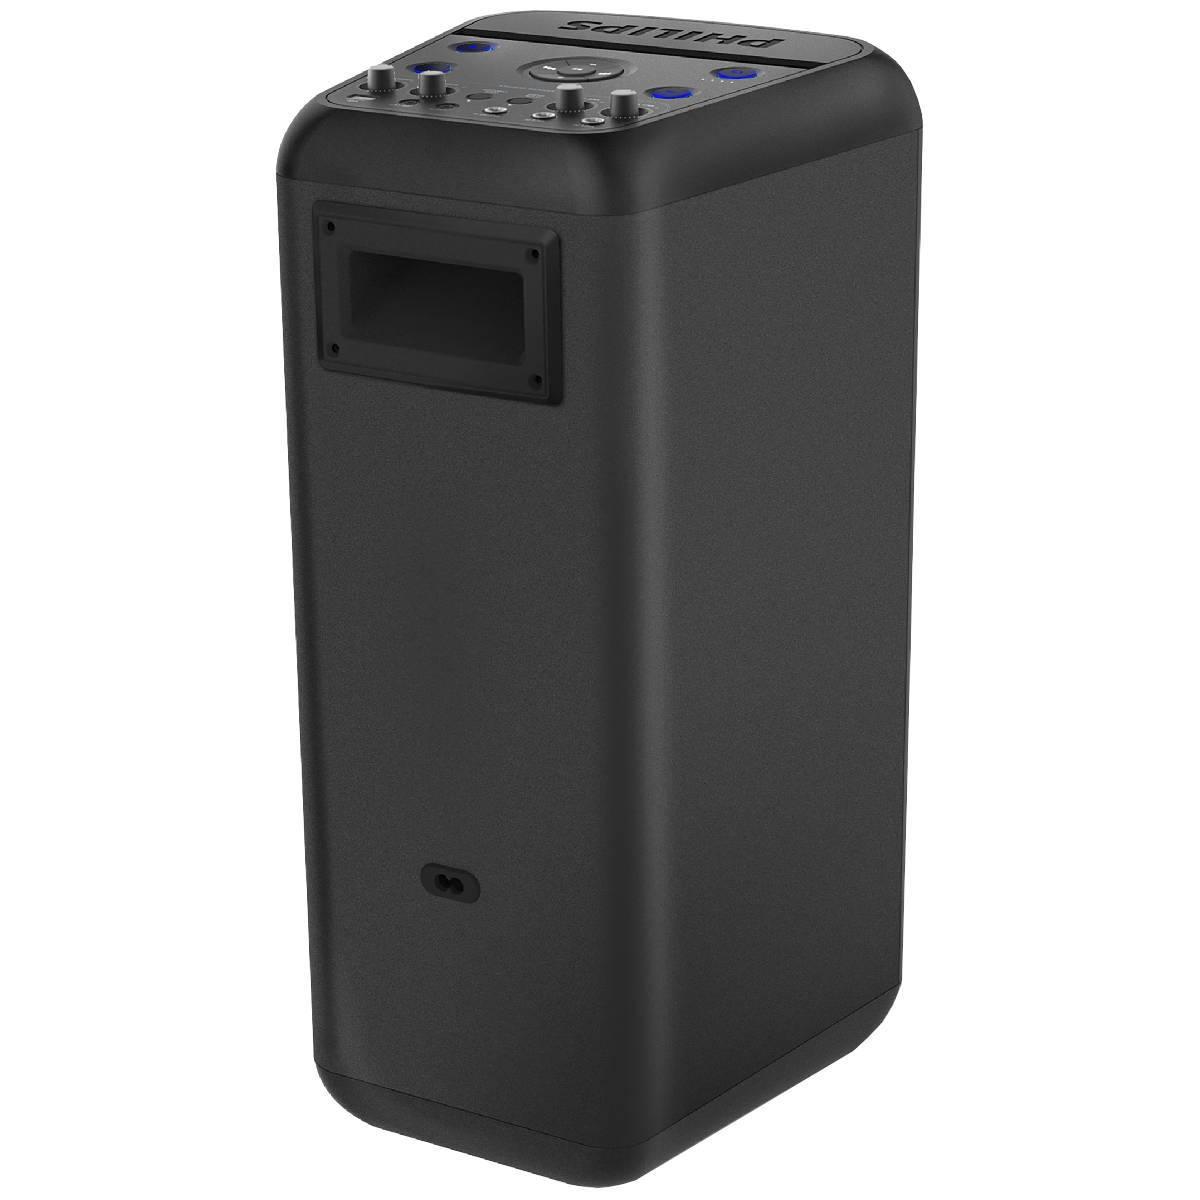 CAIXA DE SOM PARTY SPEAKER BLUETOOTH LED/USB/AUXILIAR 80W TANX200 PRETA  - Audio Video & cia